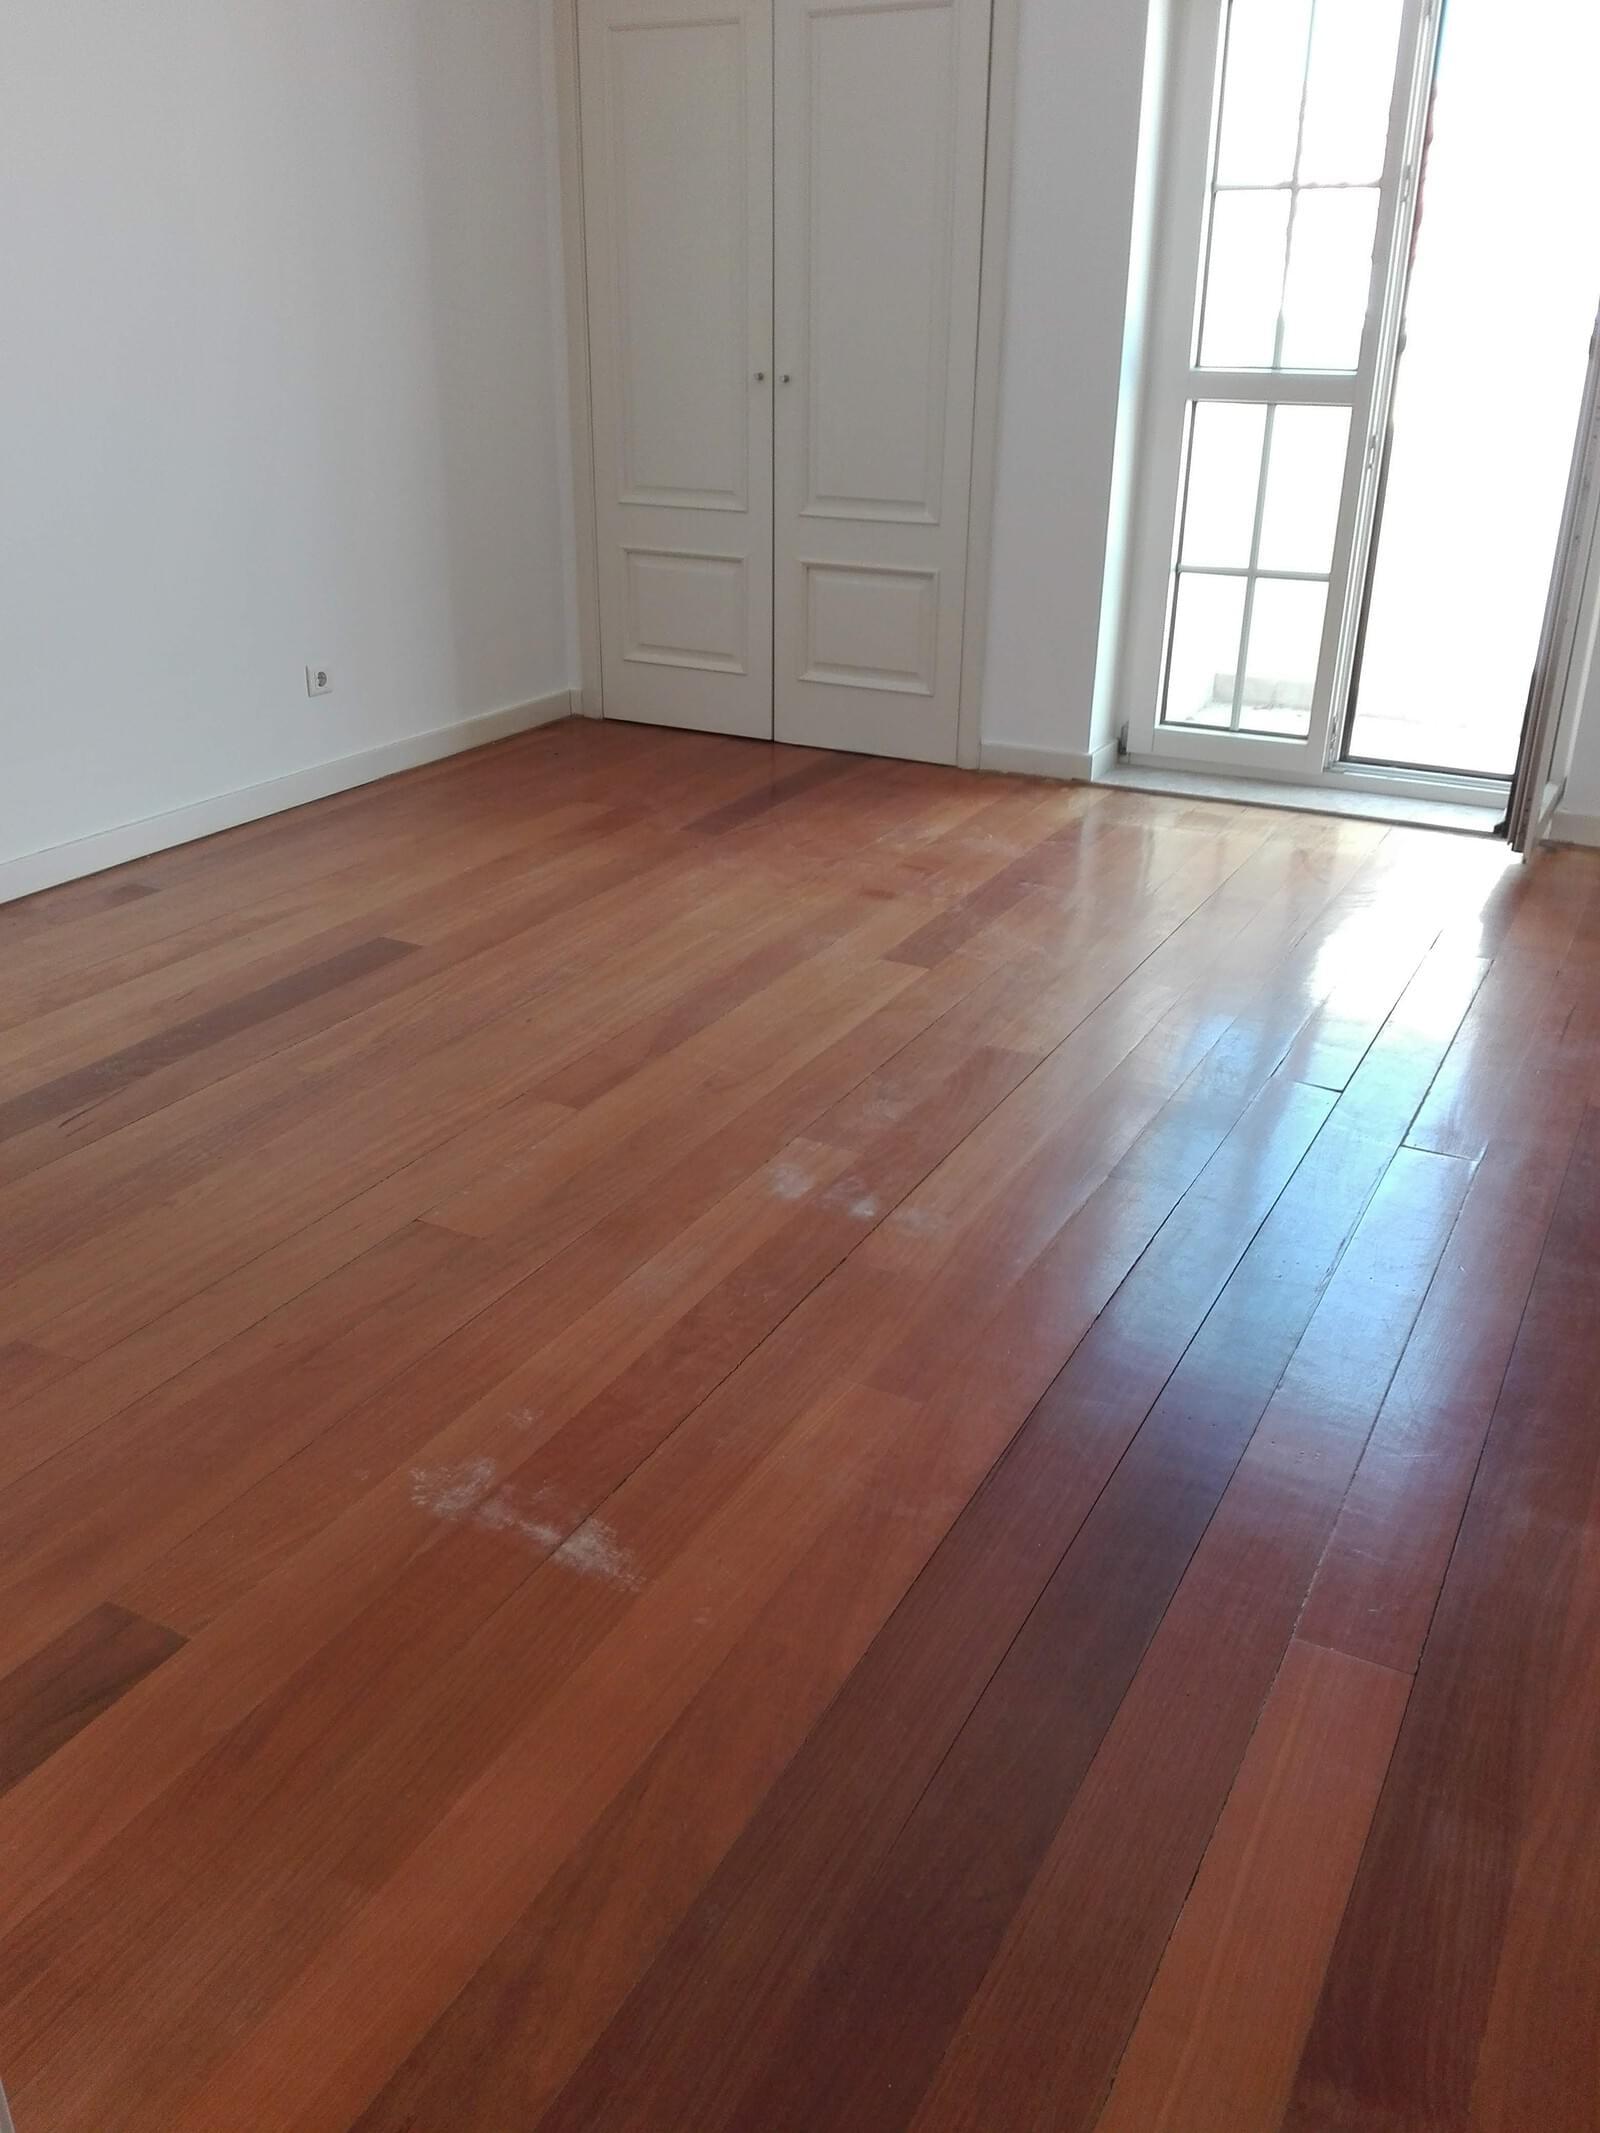 pf17908-apartamento-t1-lisboa-929e52aa-d384-4b45-8949-a1fe45f71f59